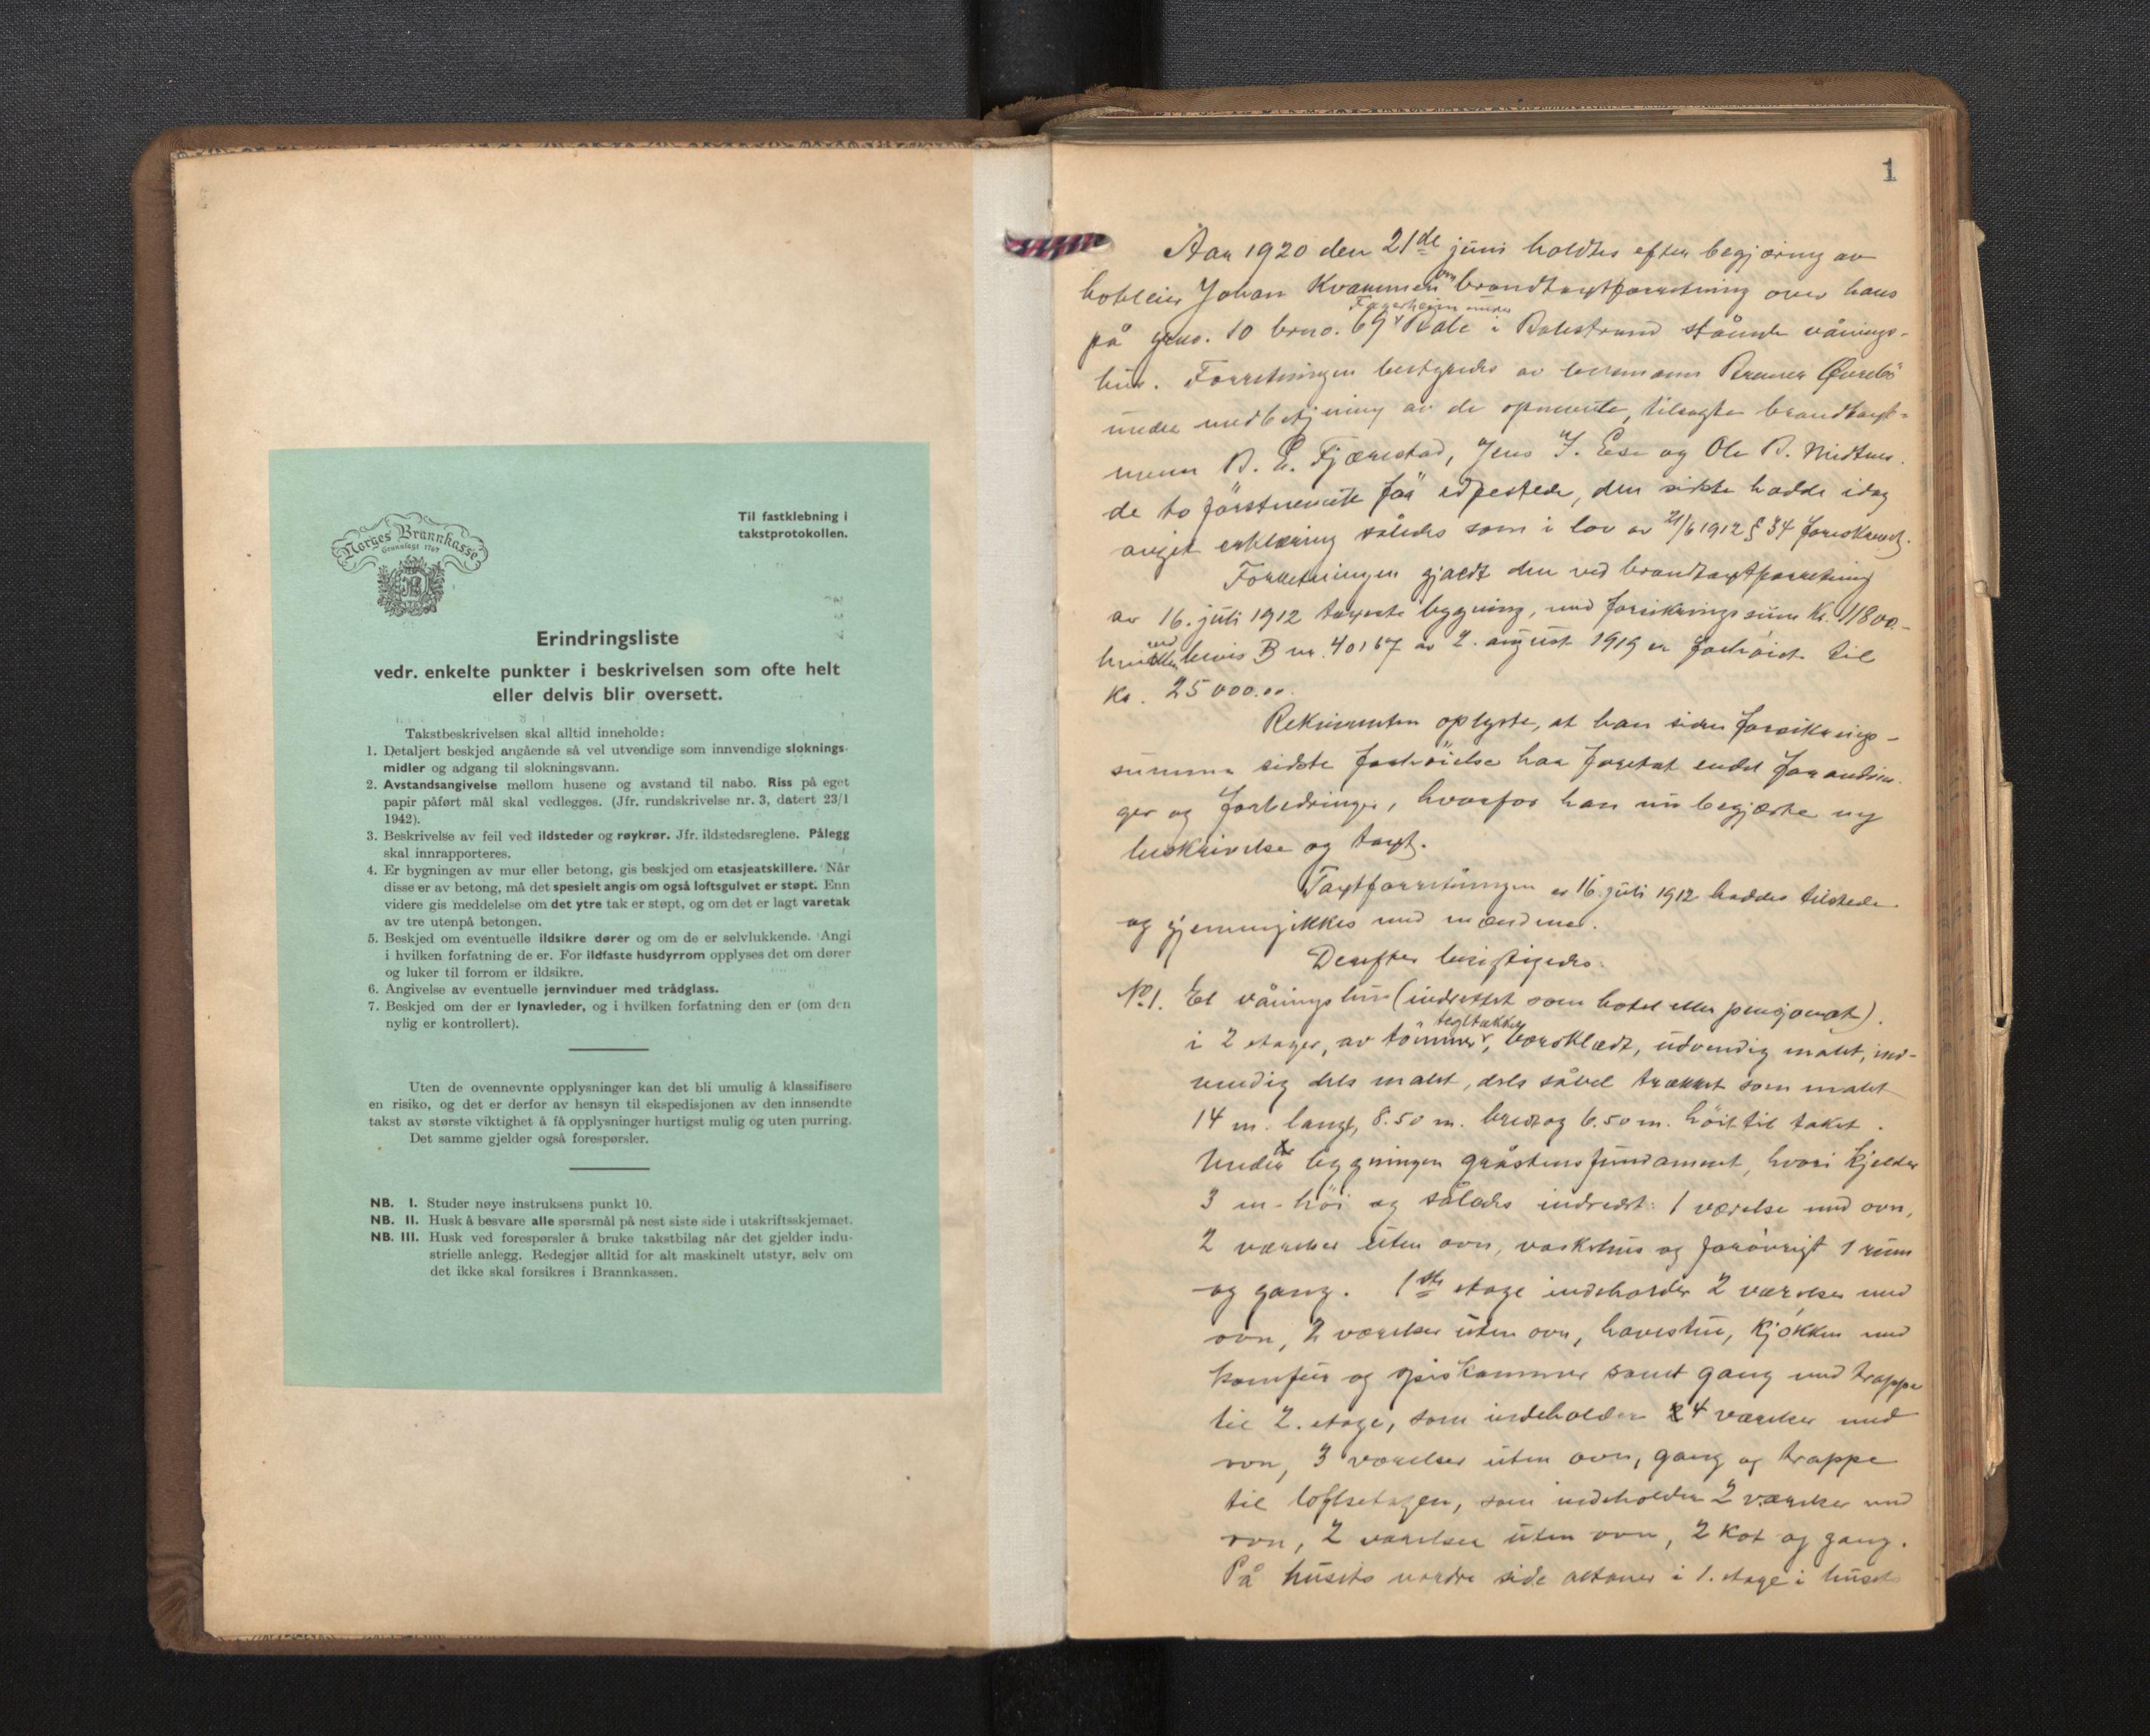 SAB, Lensmannen i Balestrand, 0012/L0002: Branntakstprotokoll, 1920-1955, s. 1